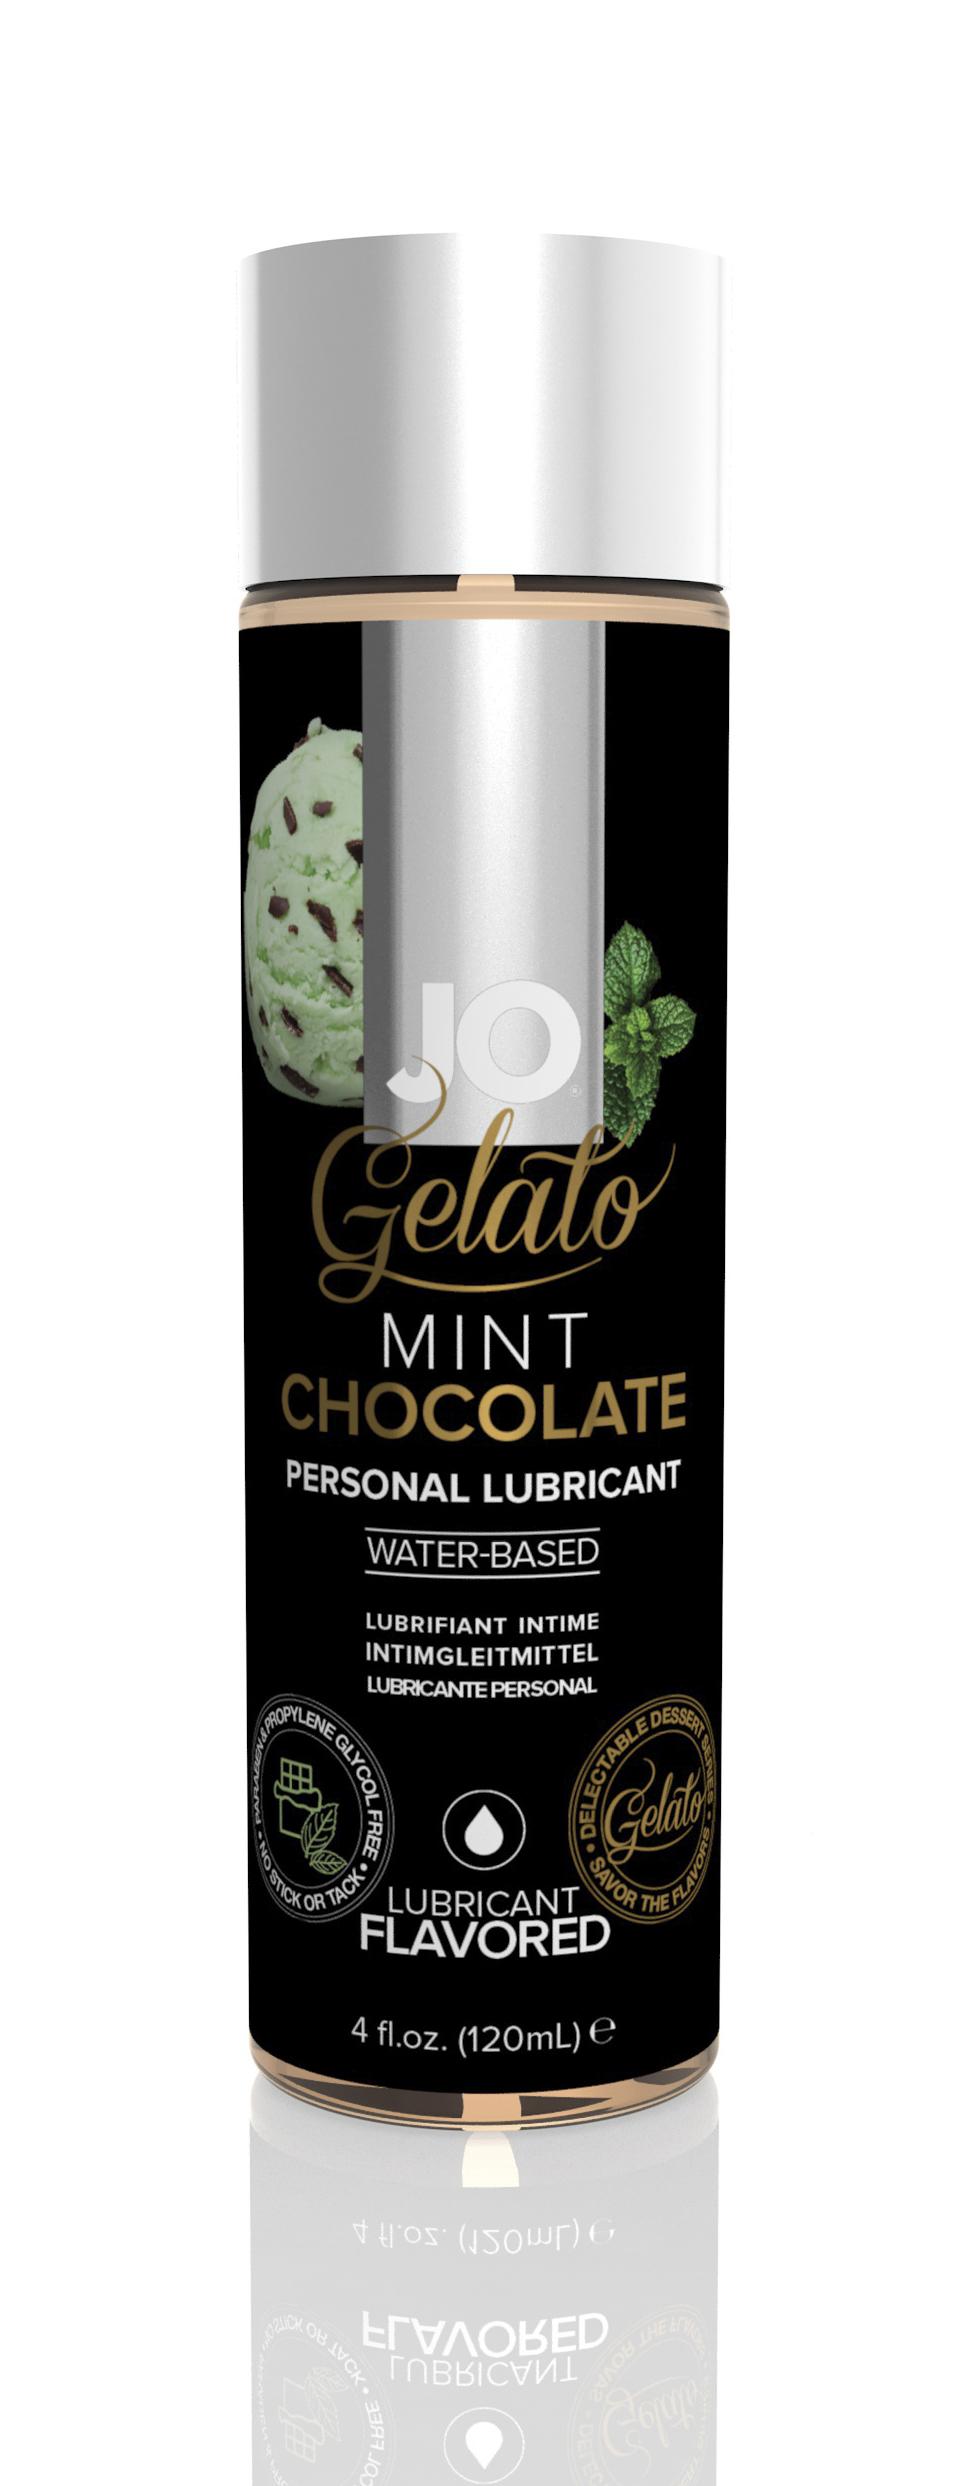 44022 - JO GELATO - MINT CHOCOLATE - LUBRICANT (WATER-BASED) 4 floz 120 mL.jpg